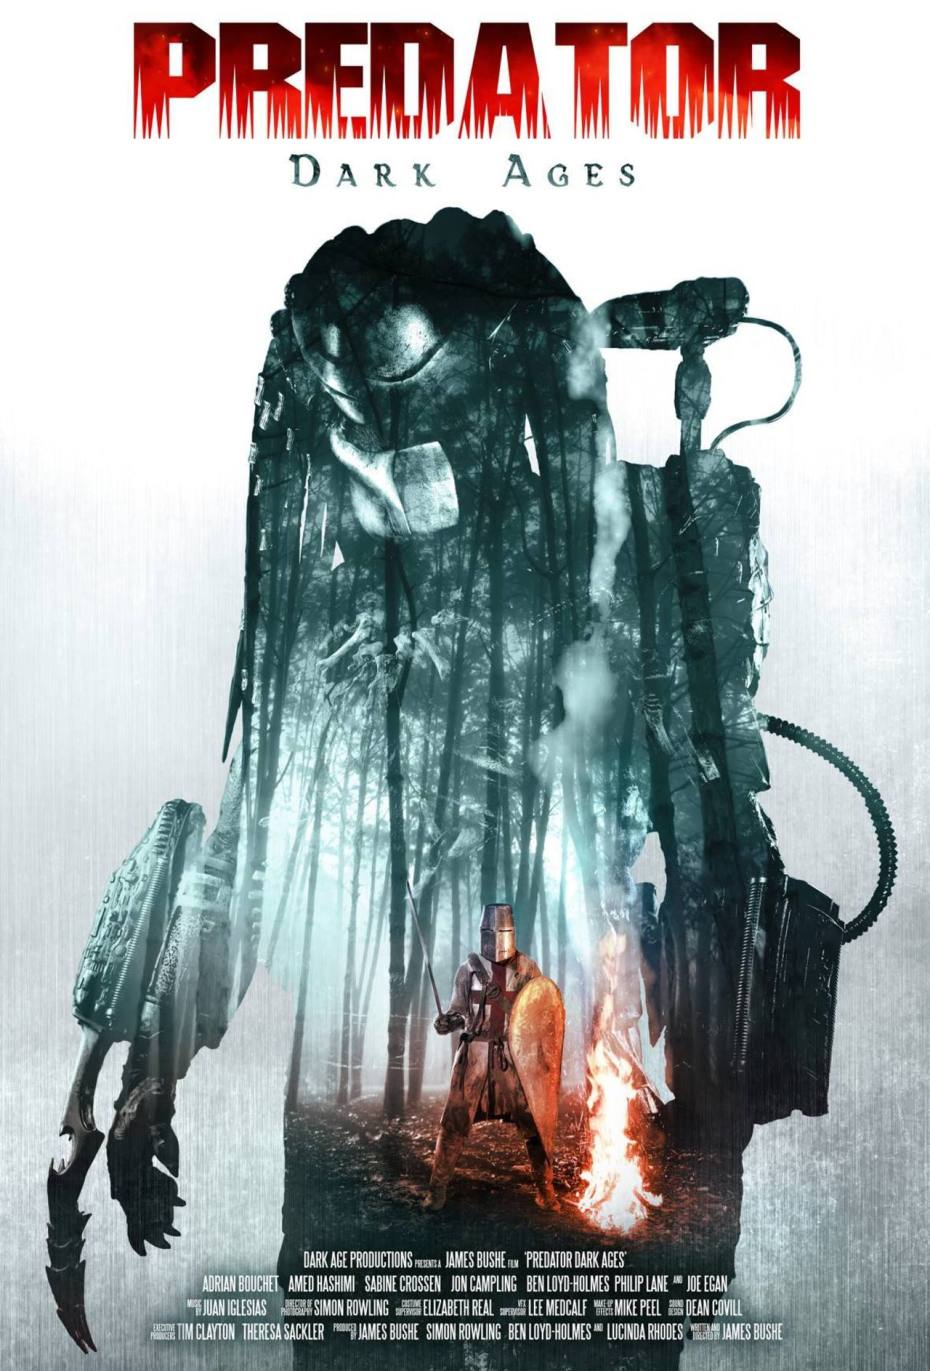 Poster for %22Predator Dark Ages%22